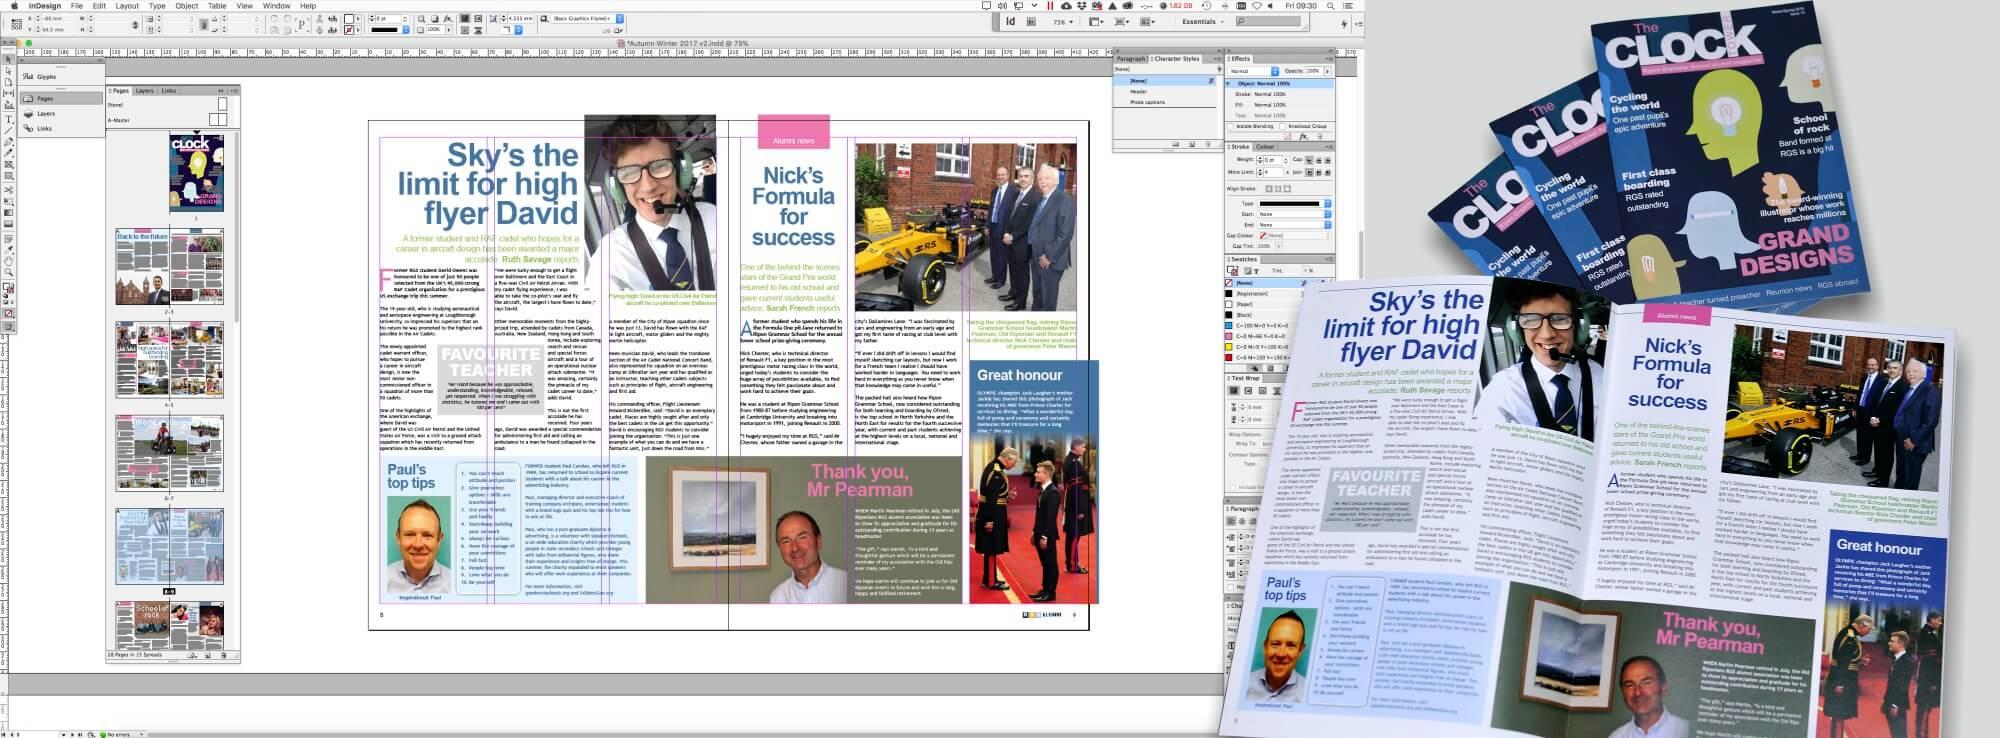 Ripon Grammas School Clocktower Magazine Design & Print